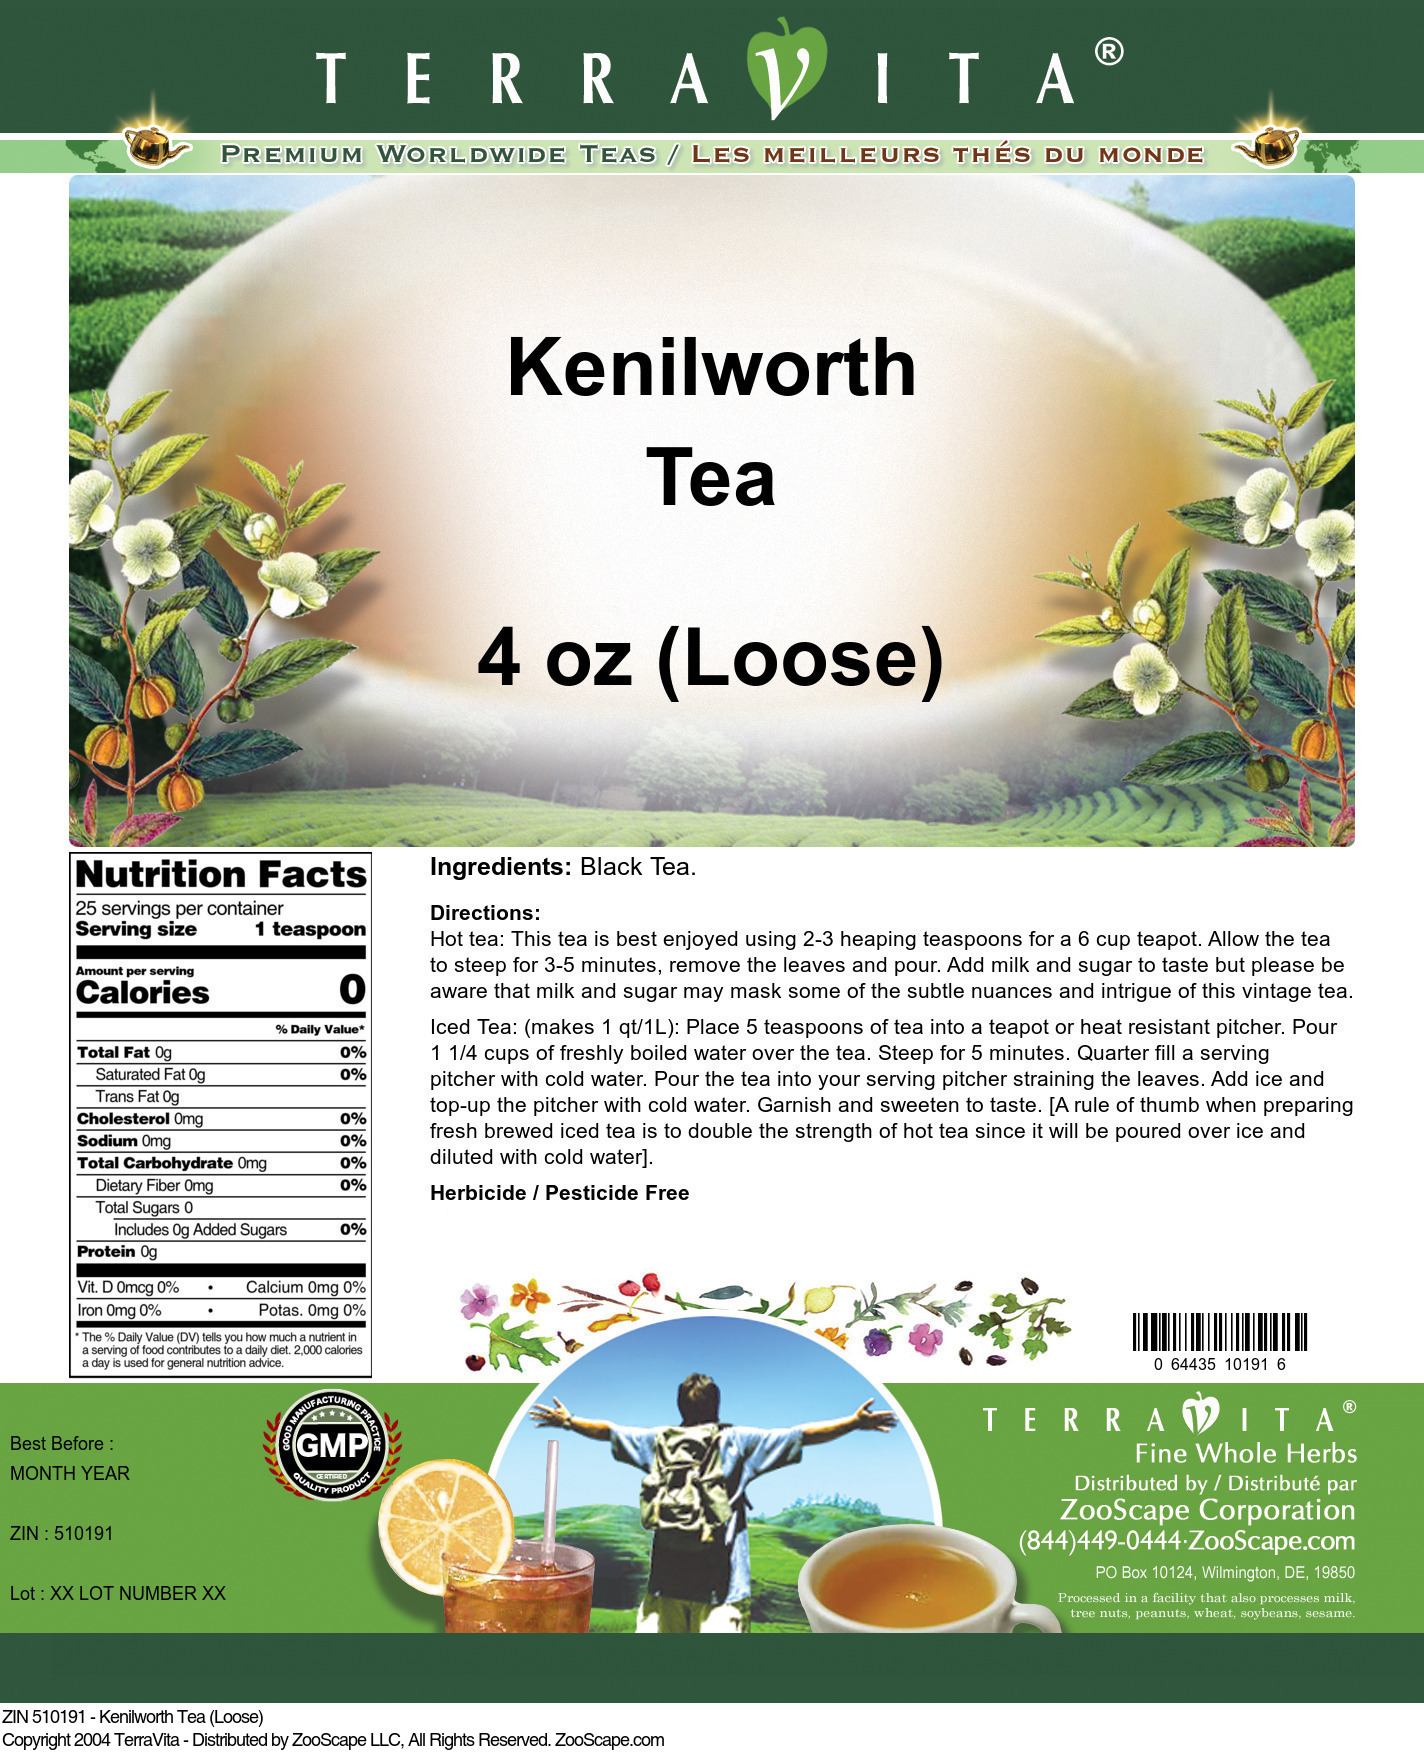 Kenilworth